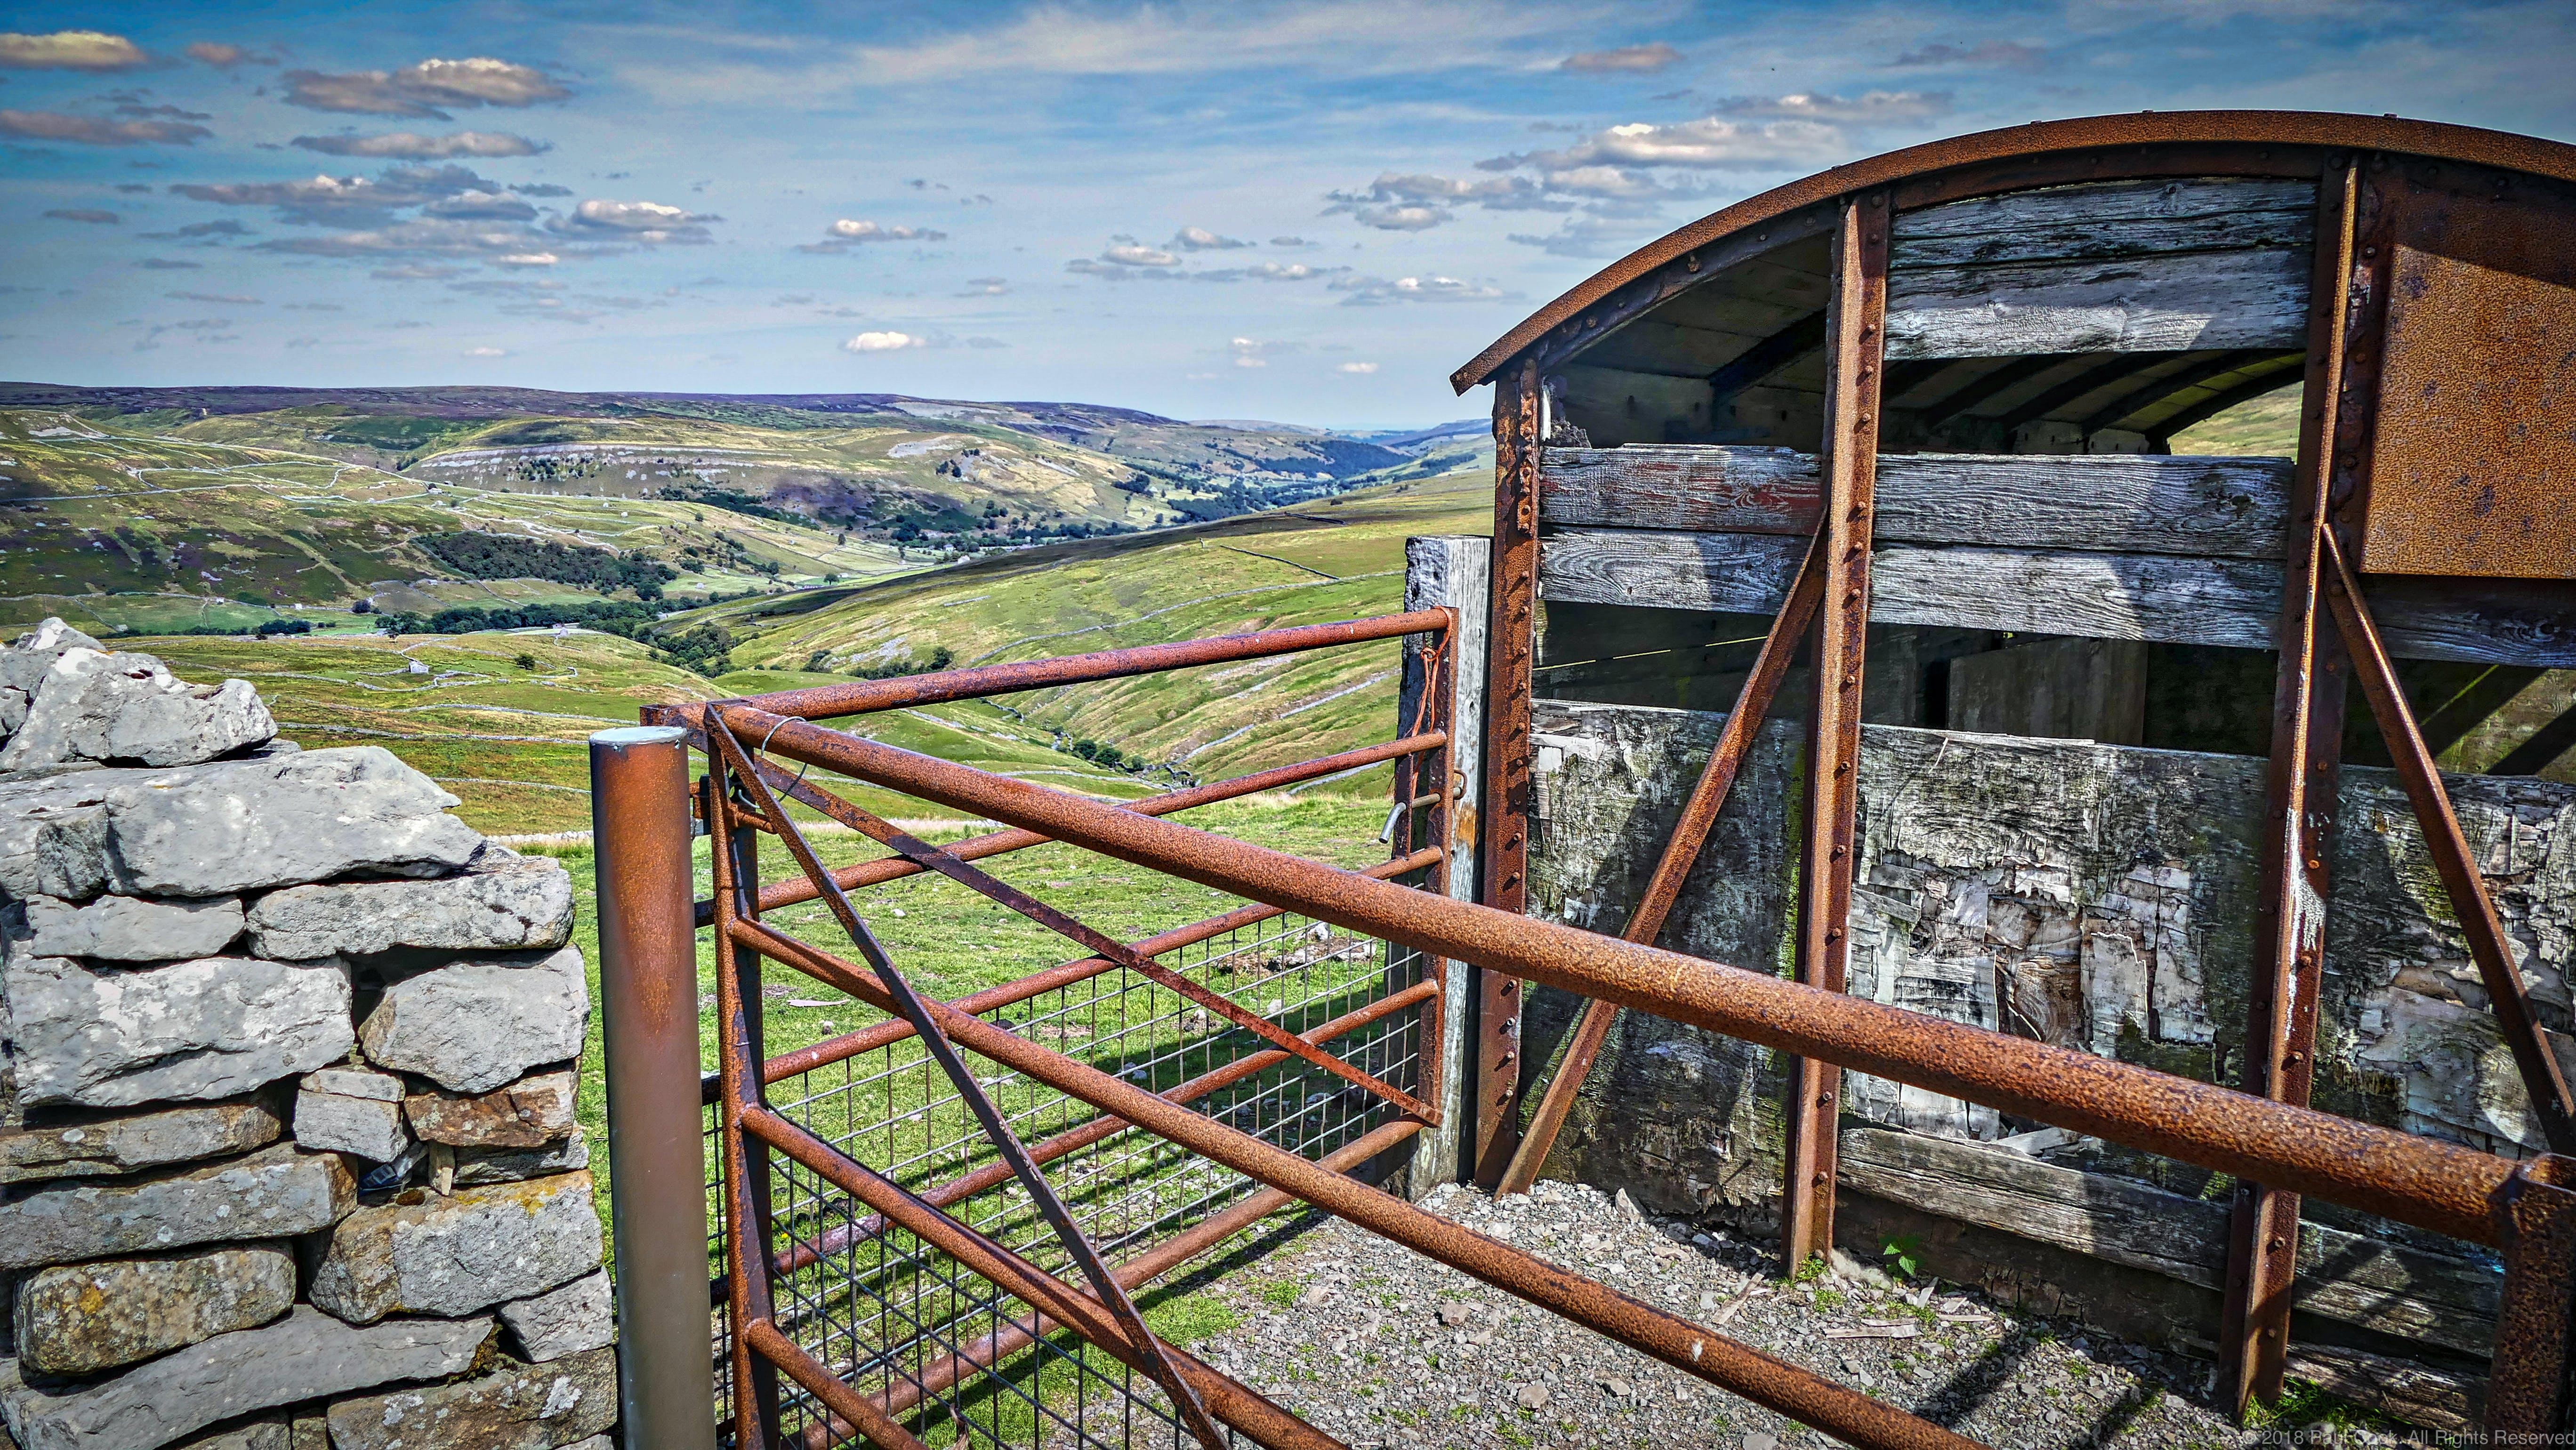 Free stock photo of buttertub pass, landscape, rusty, shed